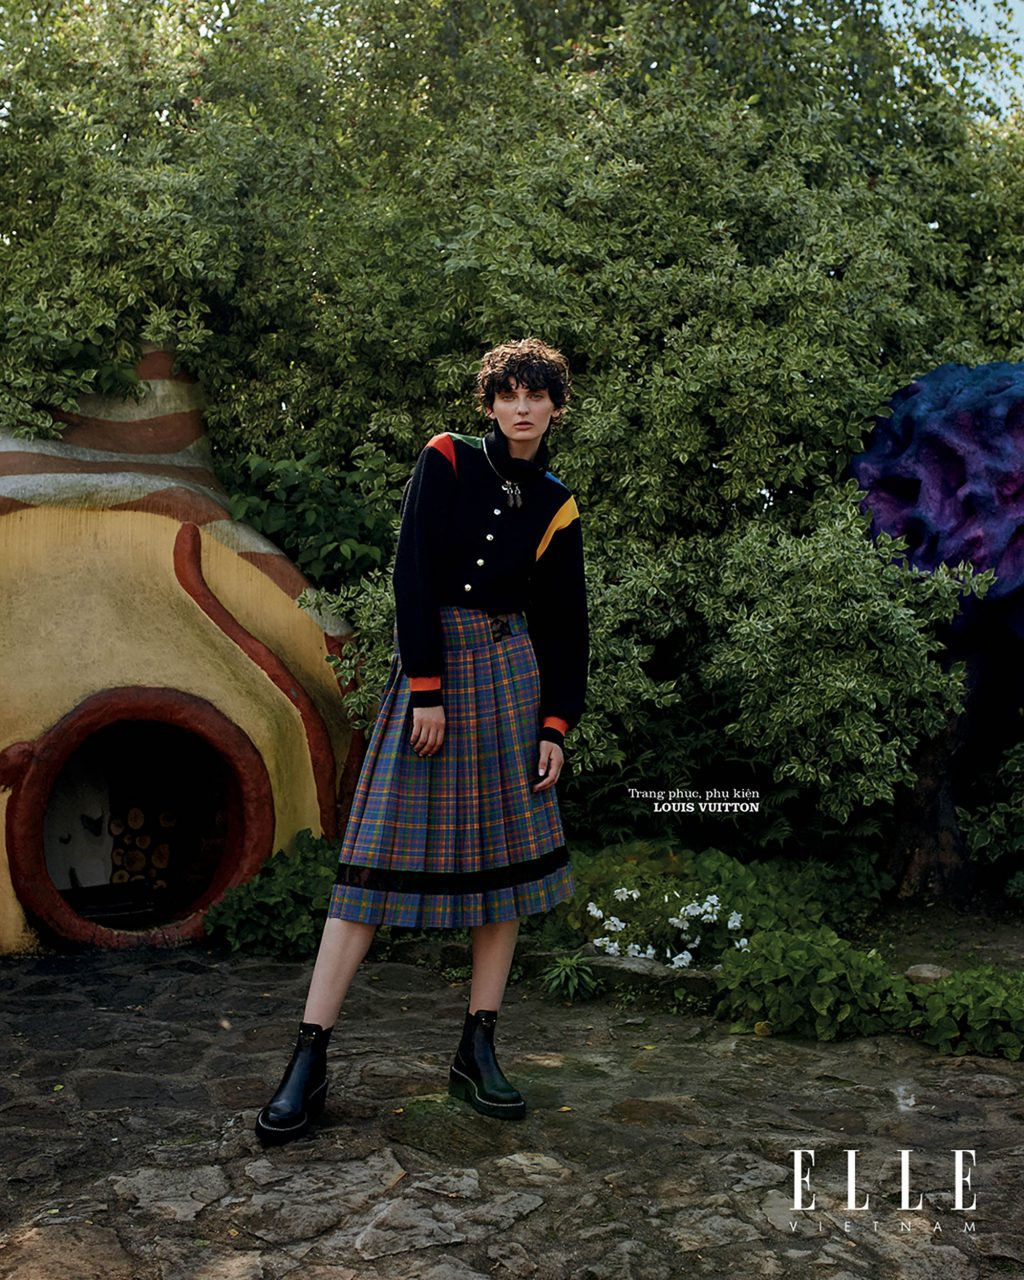 bộ ảnh thời trang wonderland trang phục phụ kiện Louis Vuitton